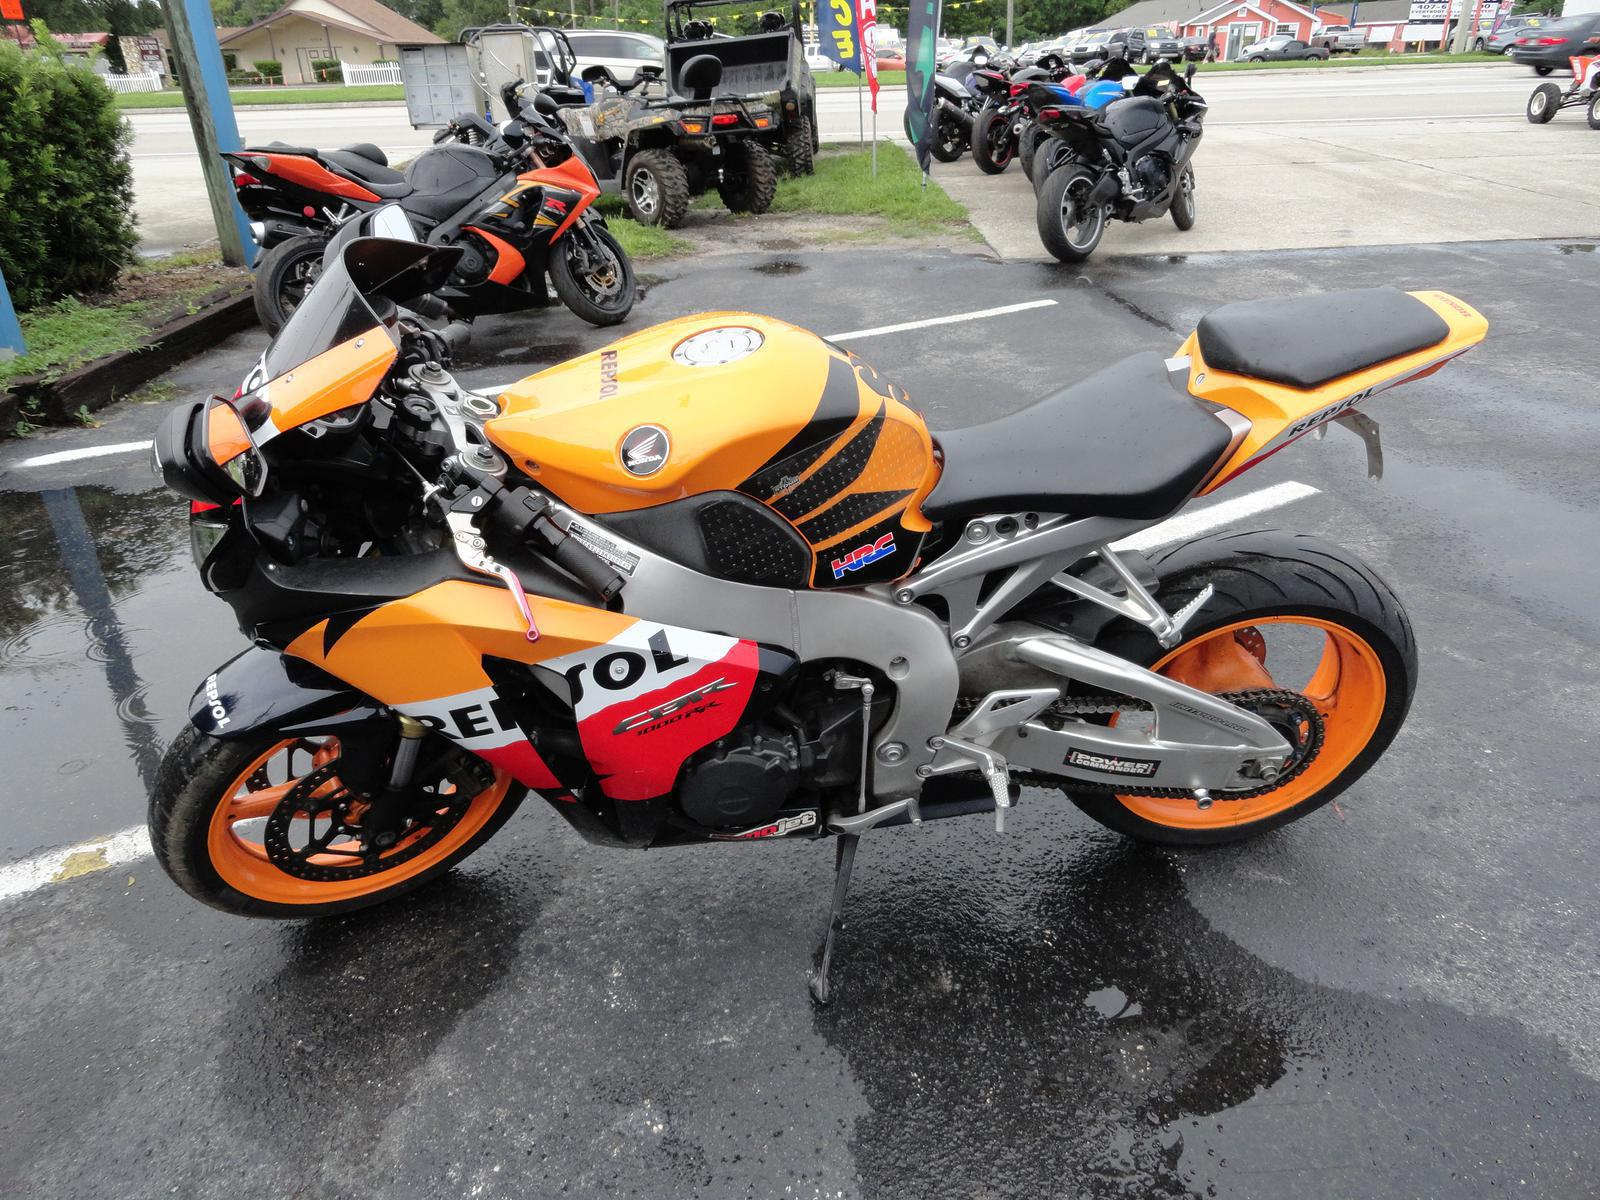 2009 Honda CBR1000RR for sale in Longwood, FL   Prime Motorcycles ...